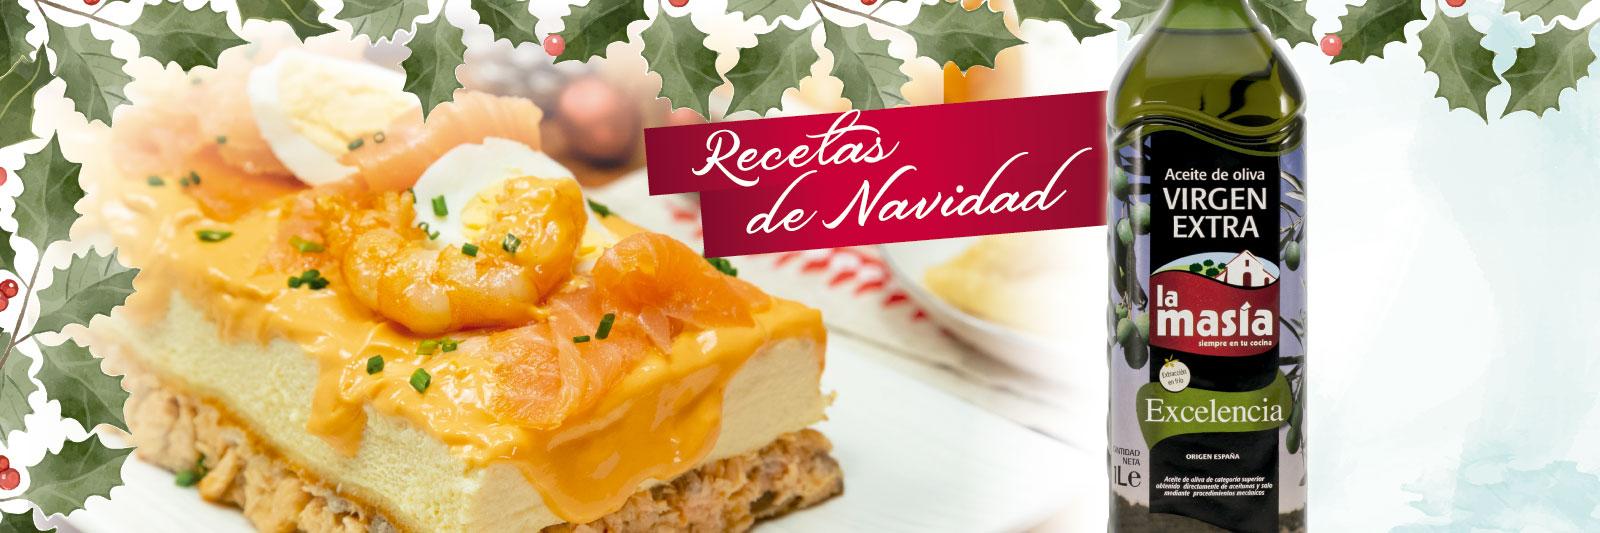 SLIDER_recetas_navidad_2020-01